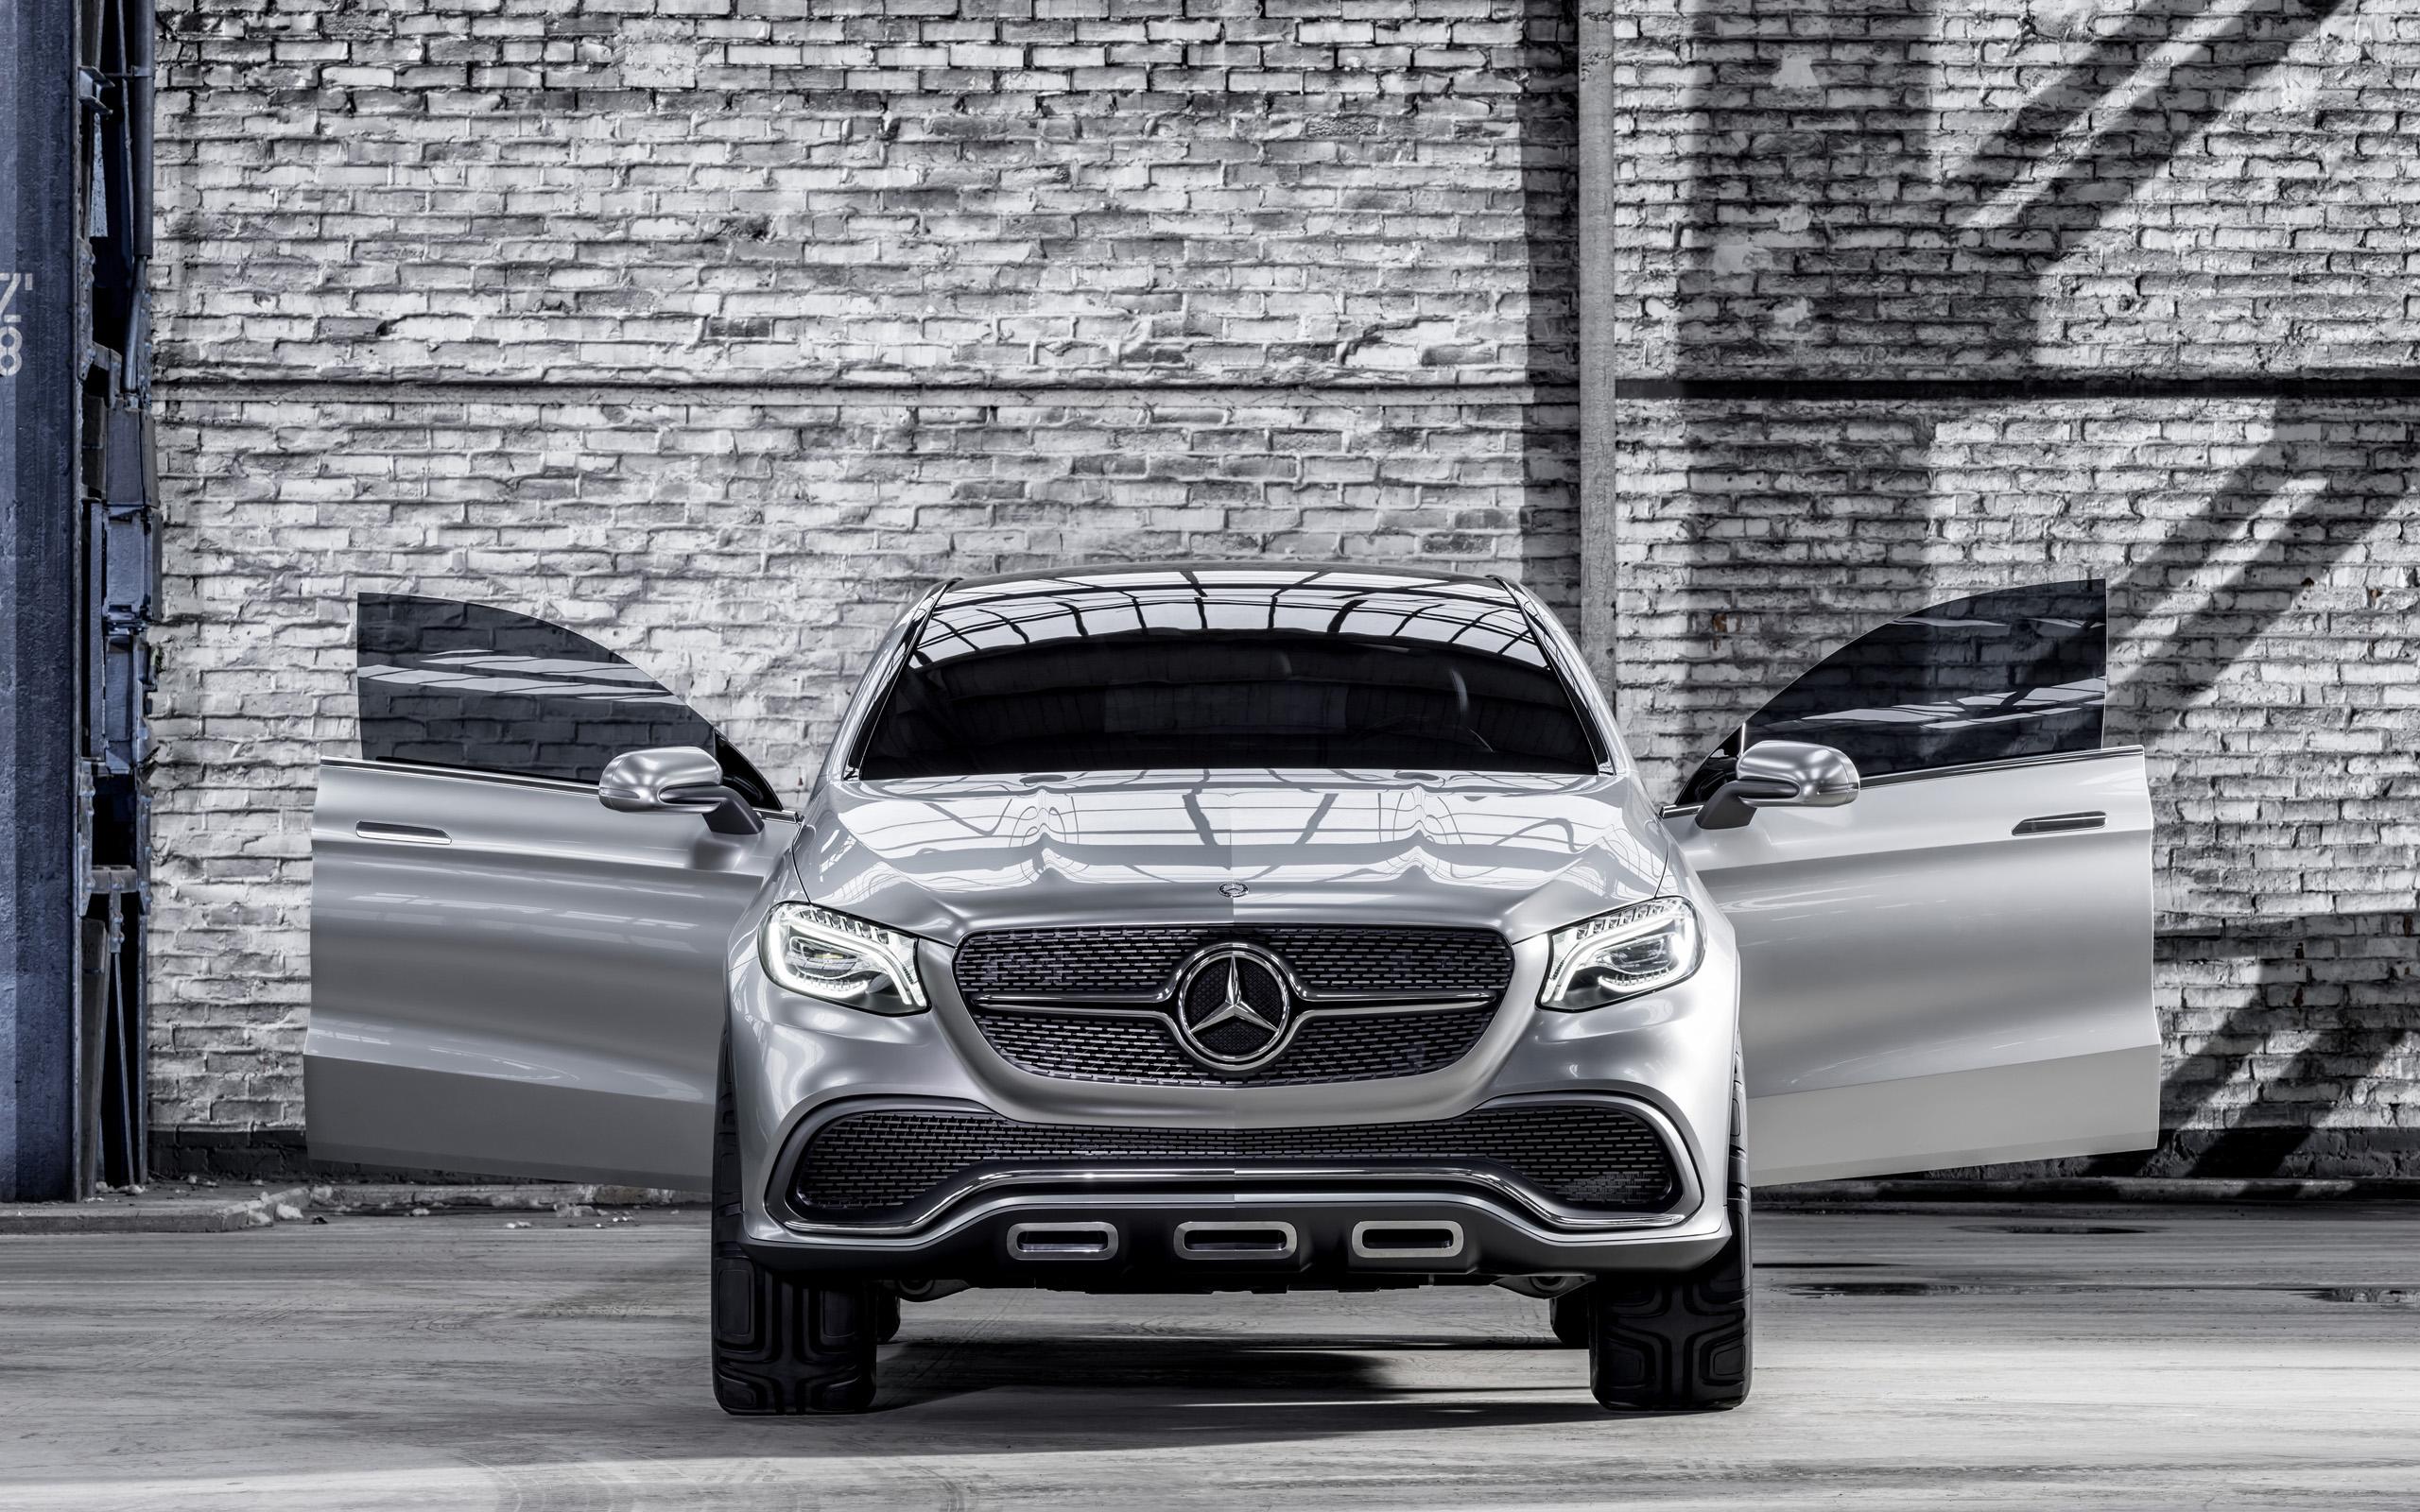 2014 mercedes benz concept coupe suv 5 wallpaper hd car for Mercedes benz suv 2014